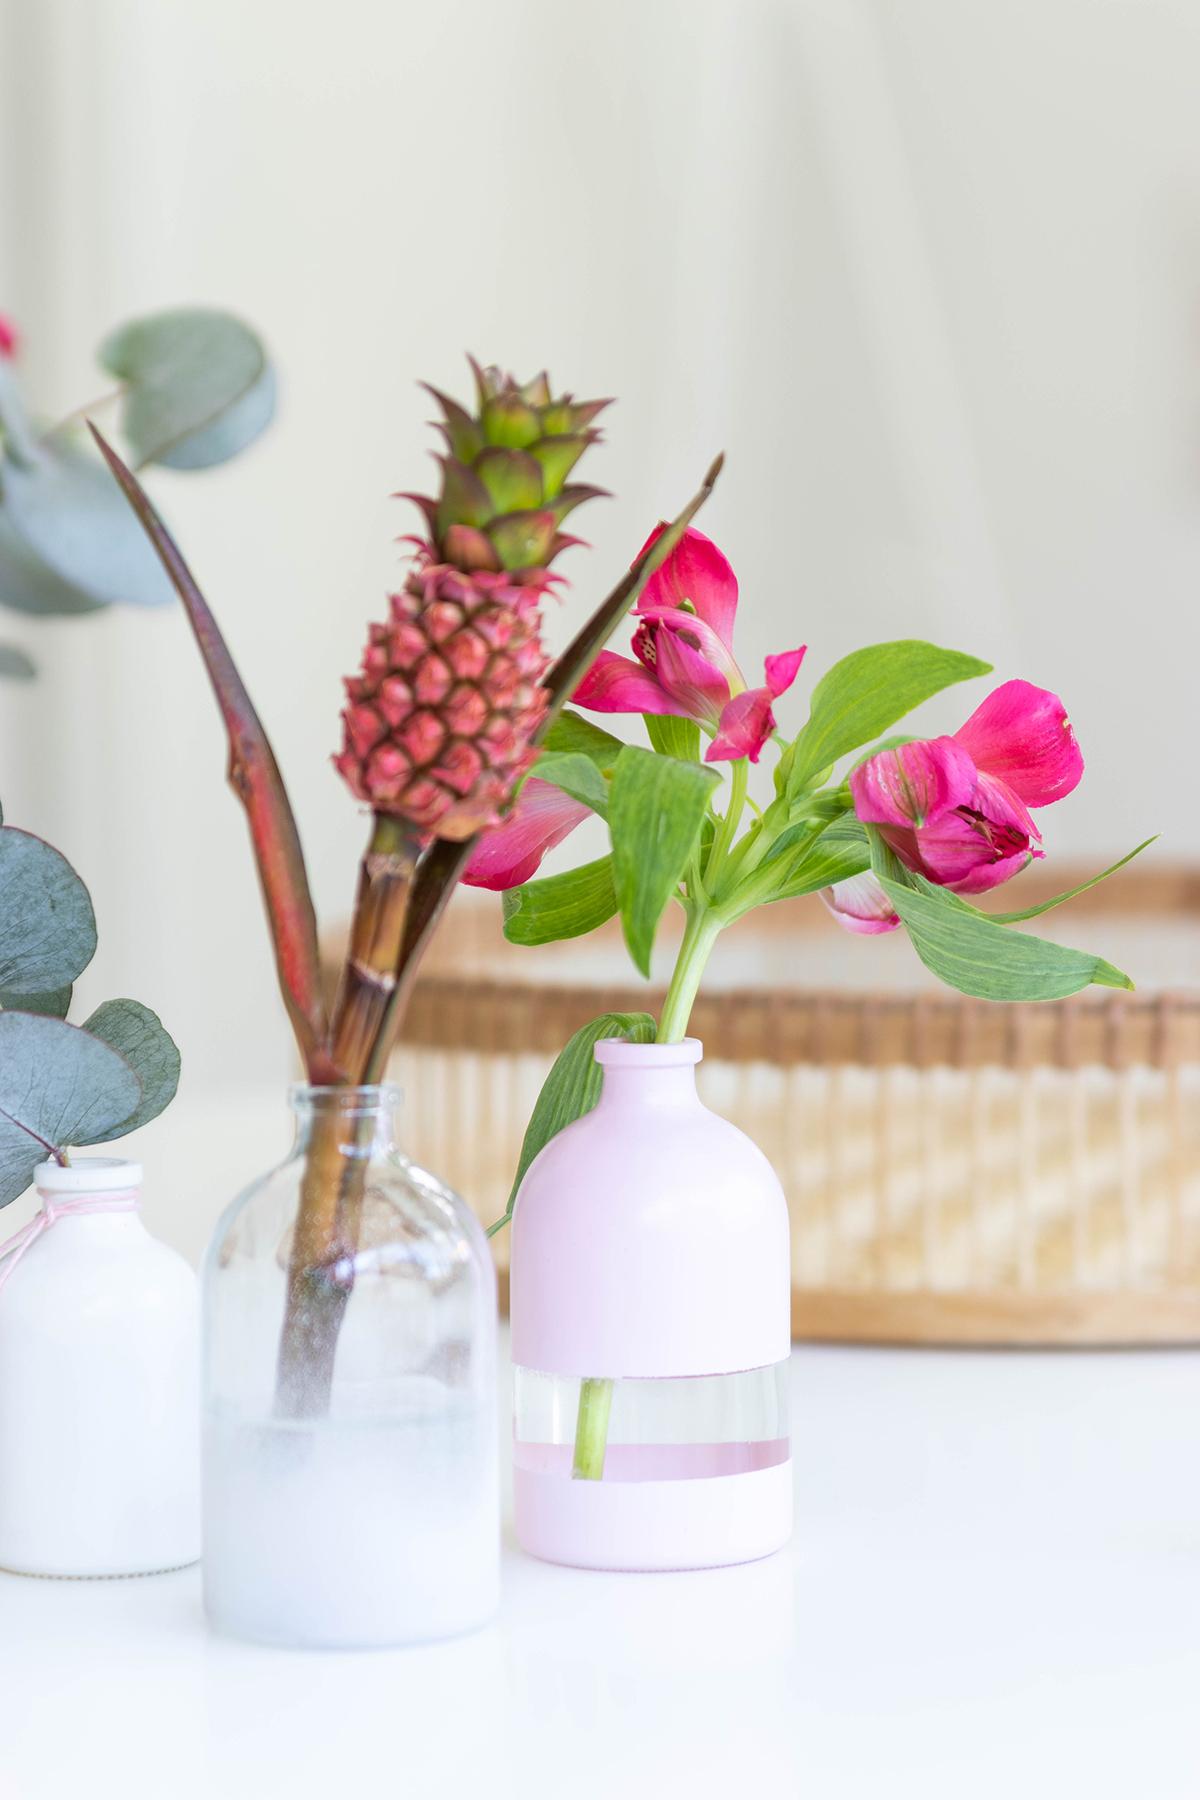 DIY Upcycling Vasen